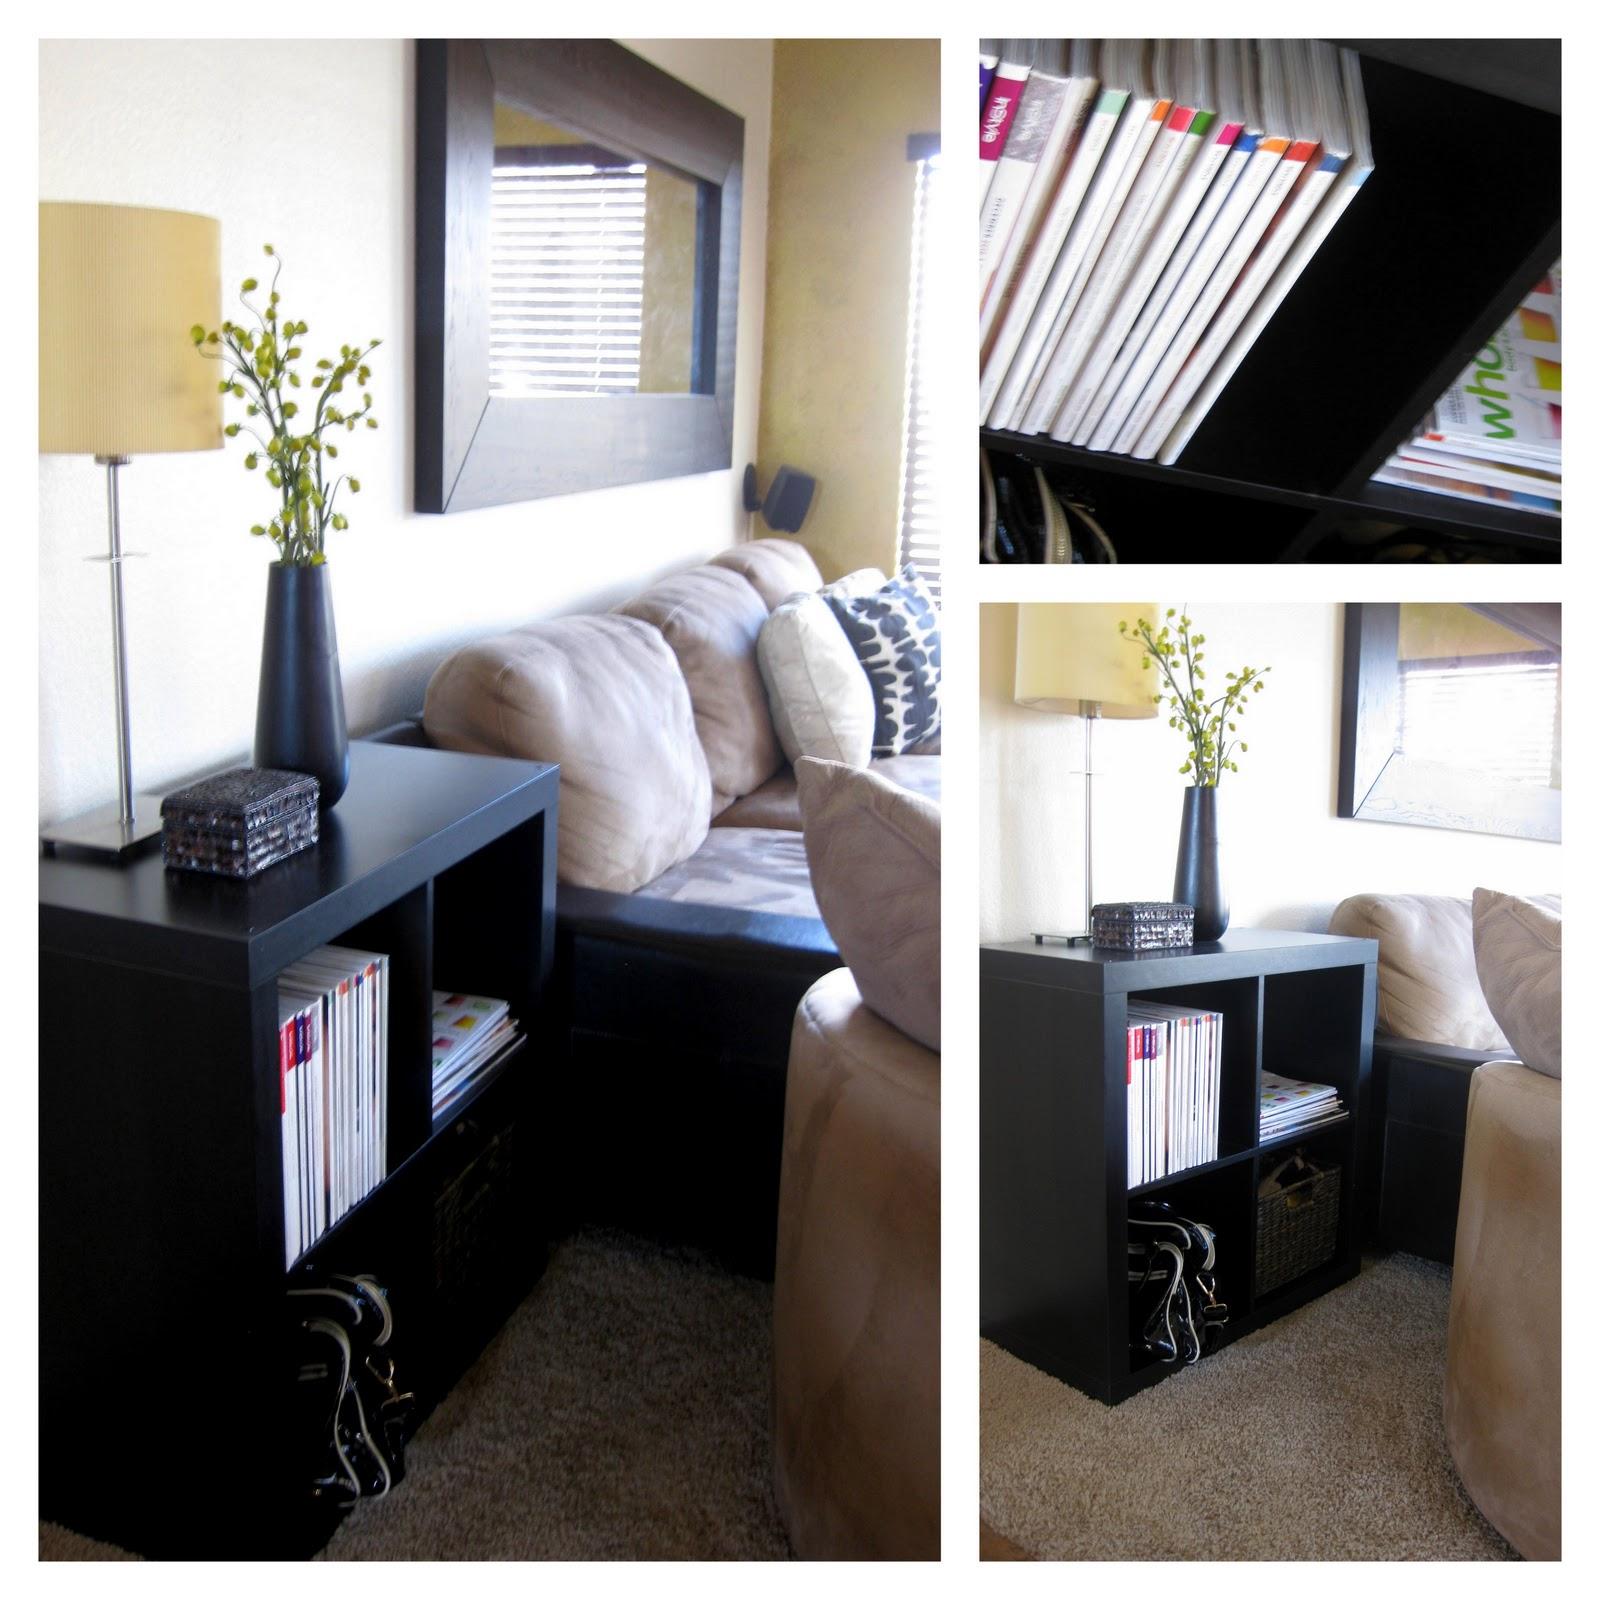 cupcake monkey january 2011. Black Bedroom Furniture Sets. Home Design Ideas